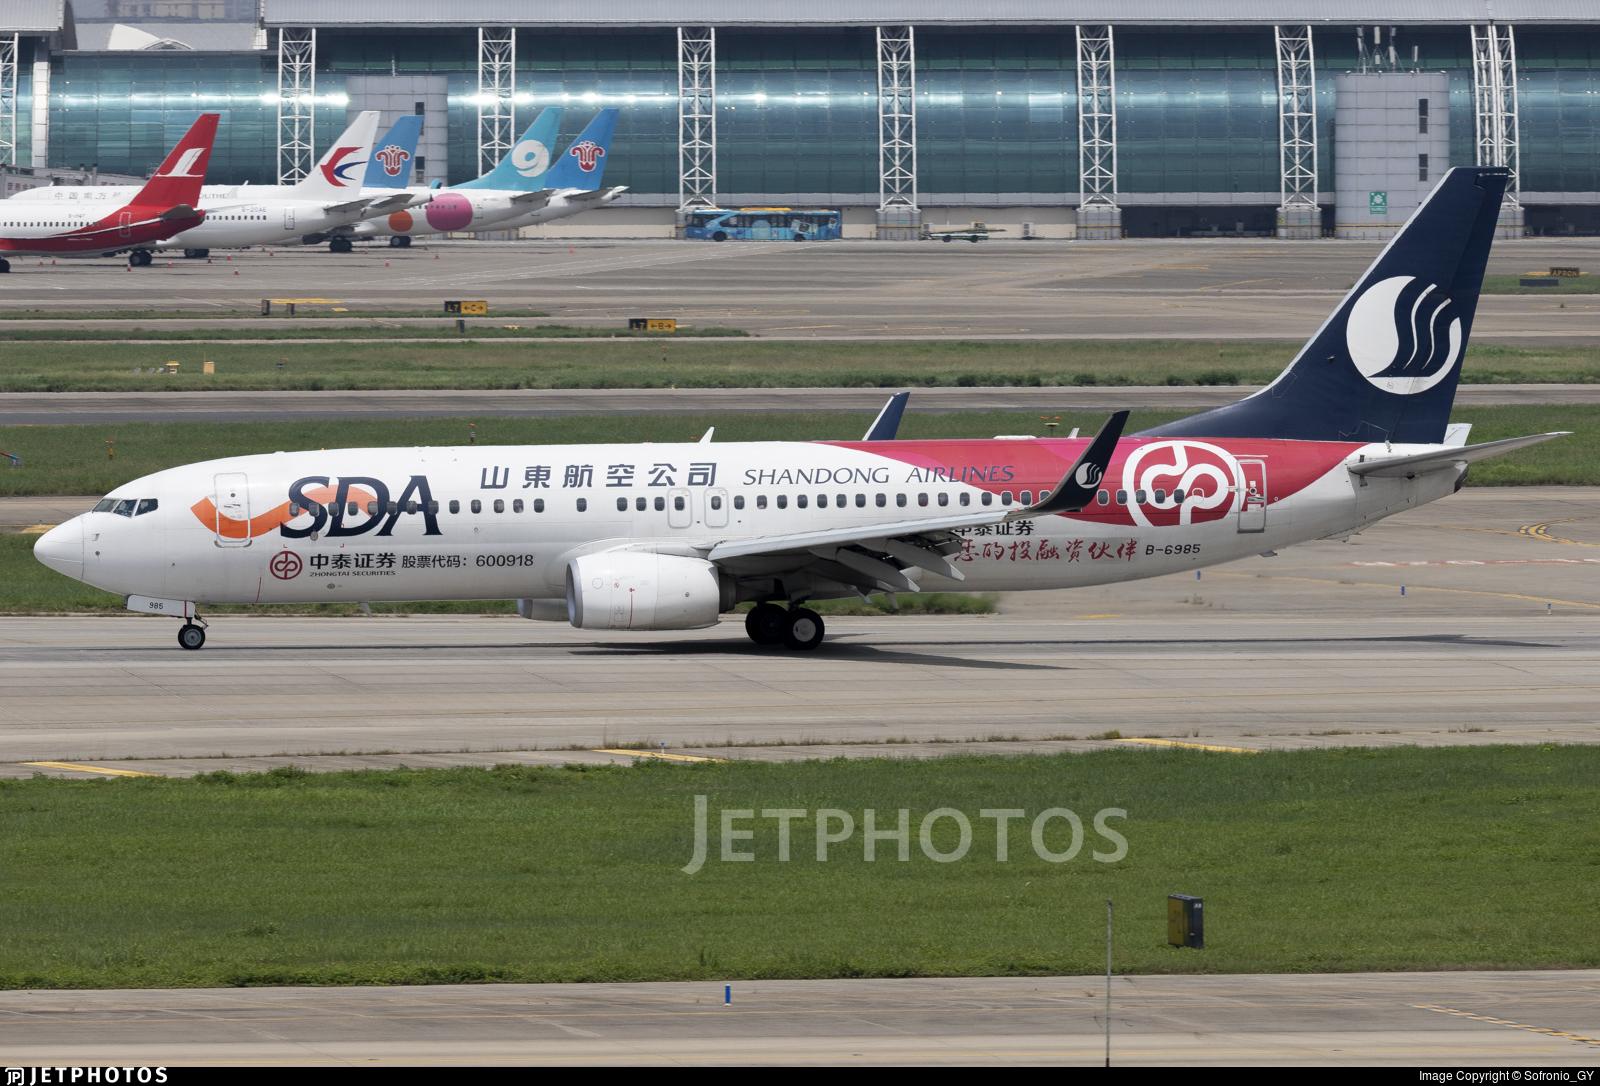 B-6985 - Boeing 737-85N - Shandong Airlines